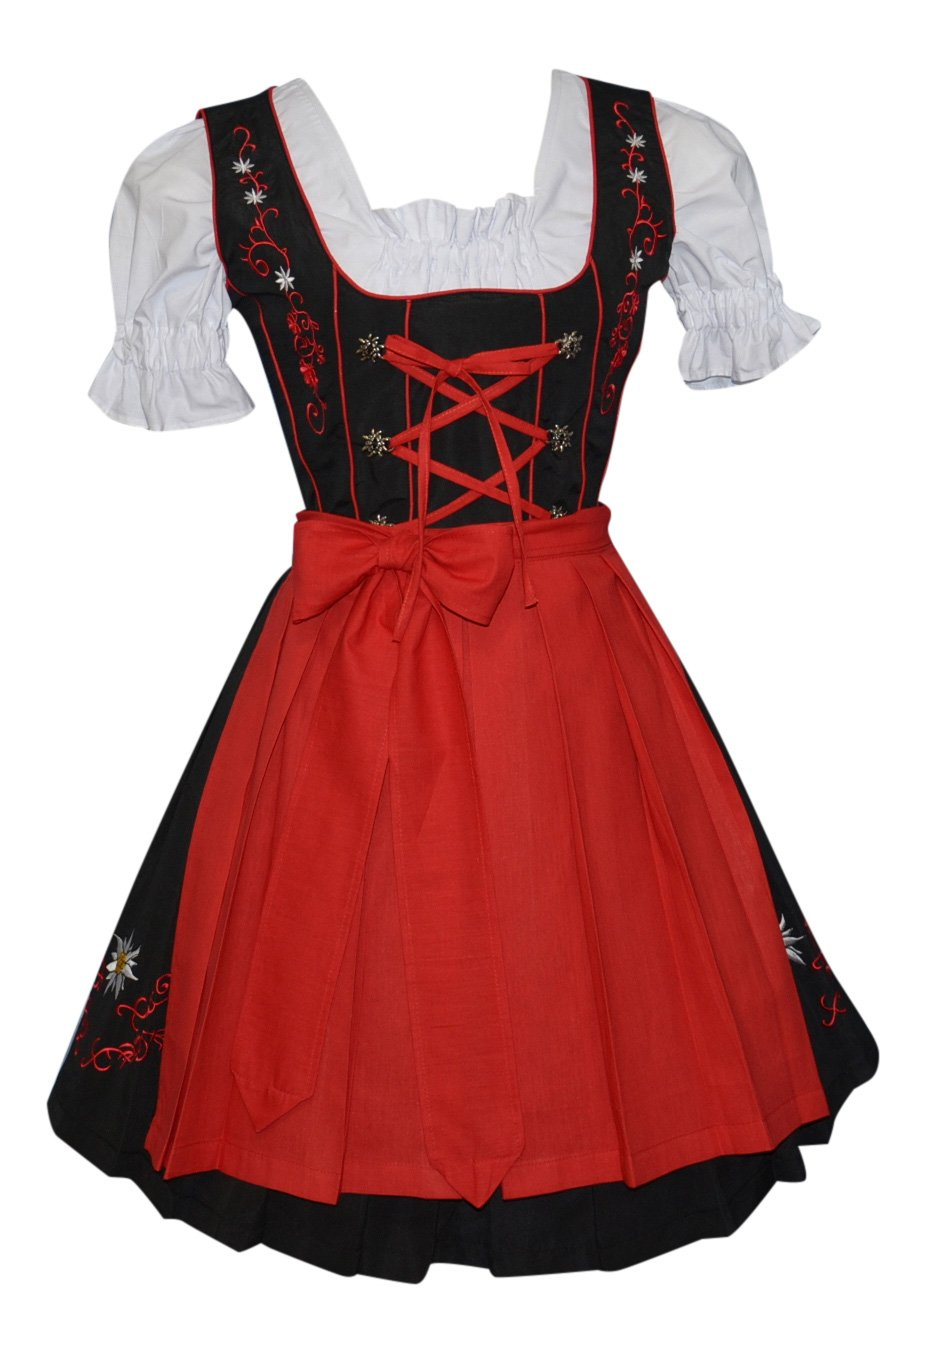 3-Piece Short German Party Oktoberfest Dirndl Dress Black & Red (18)